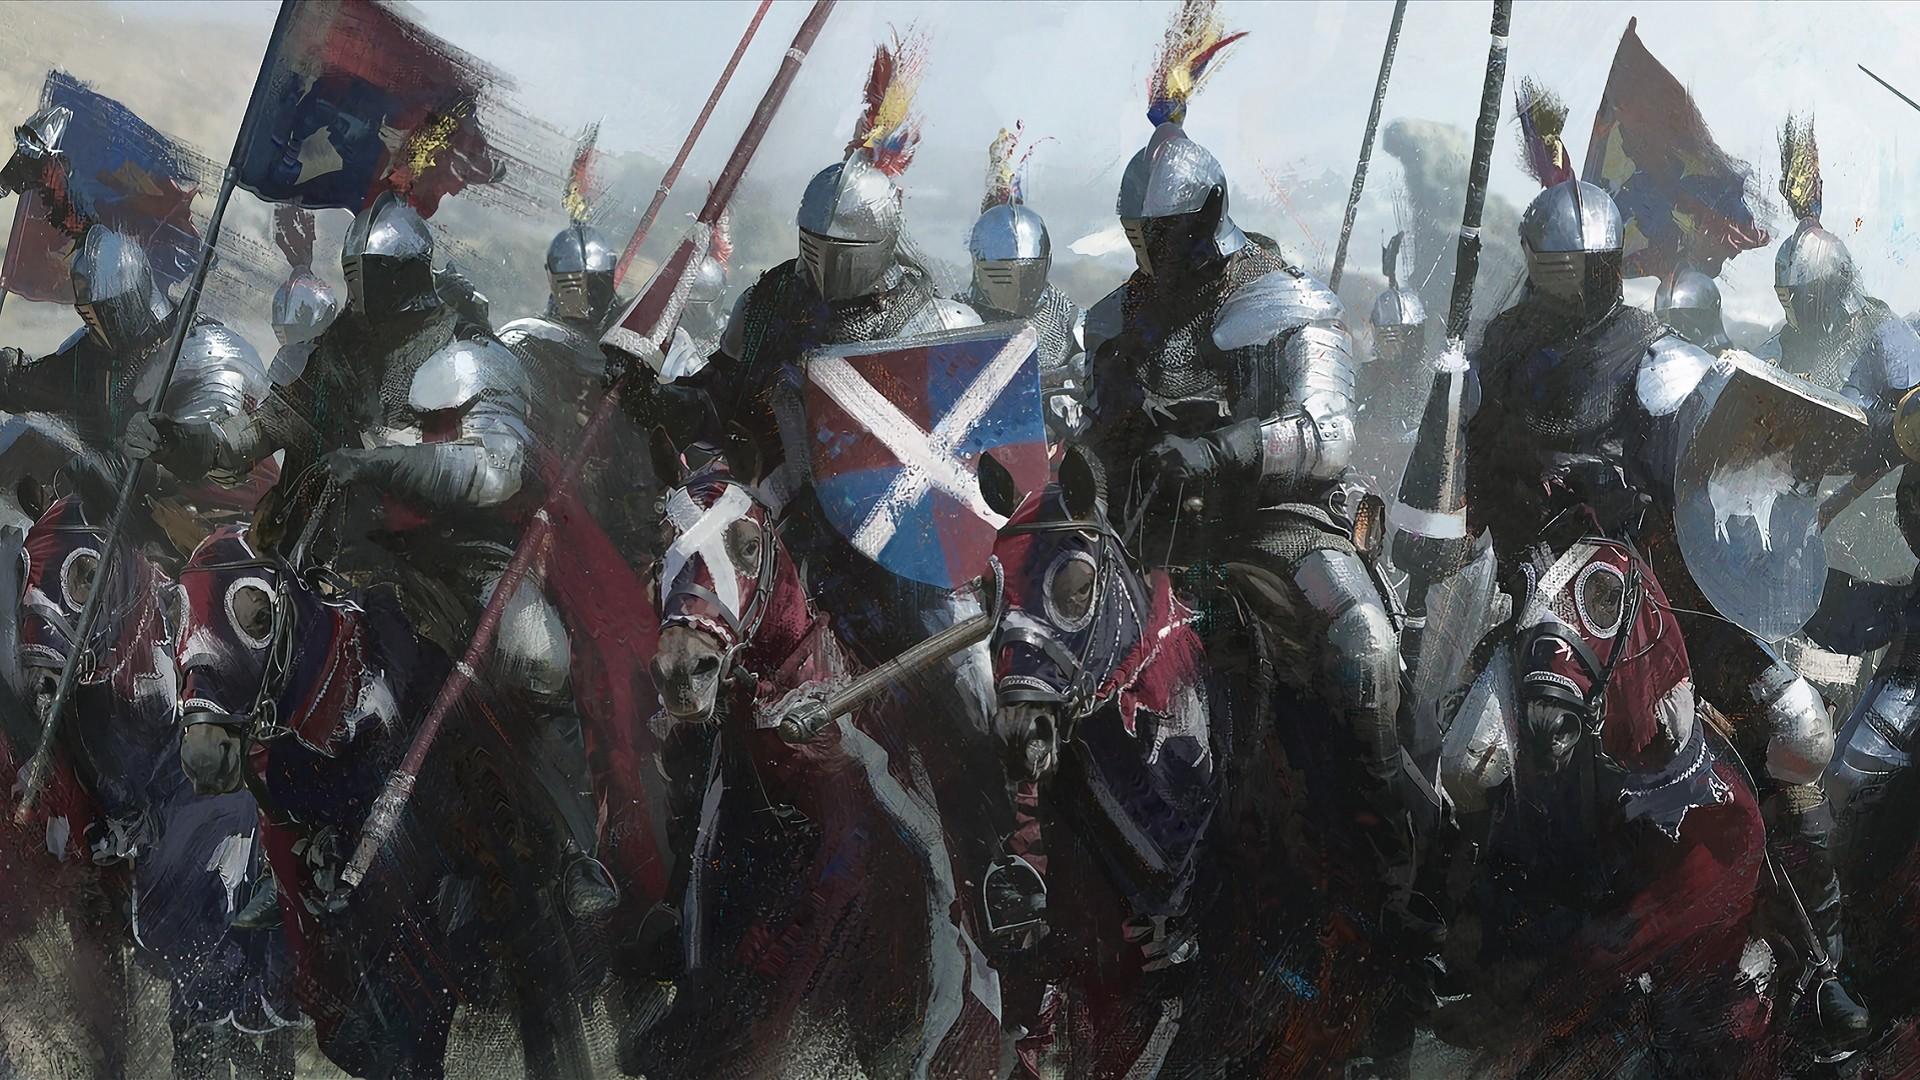 Medieval Wallpaper theme